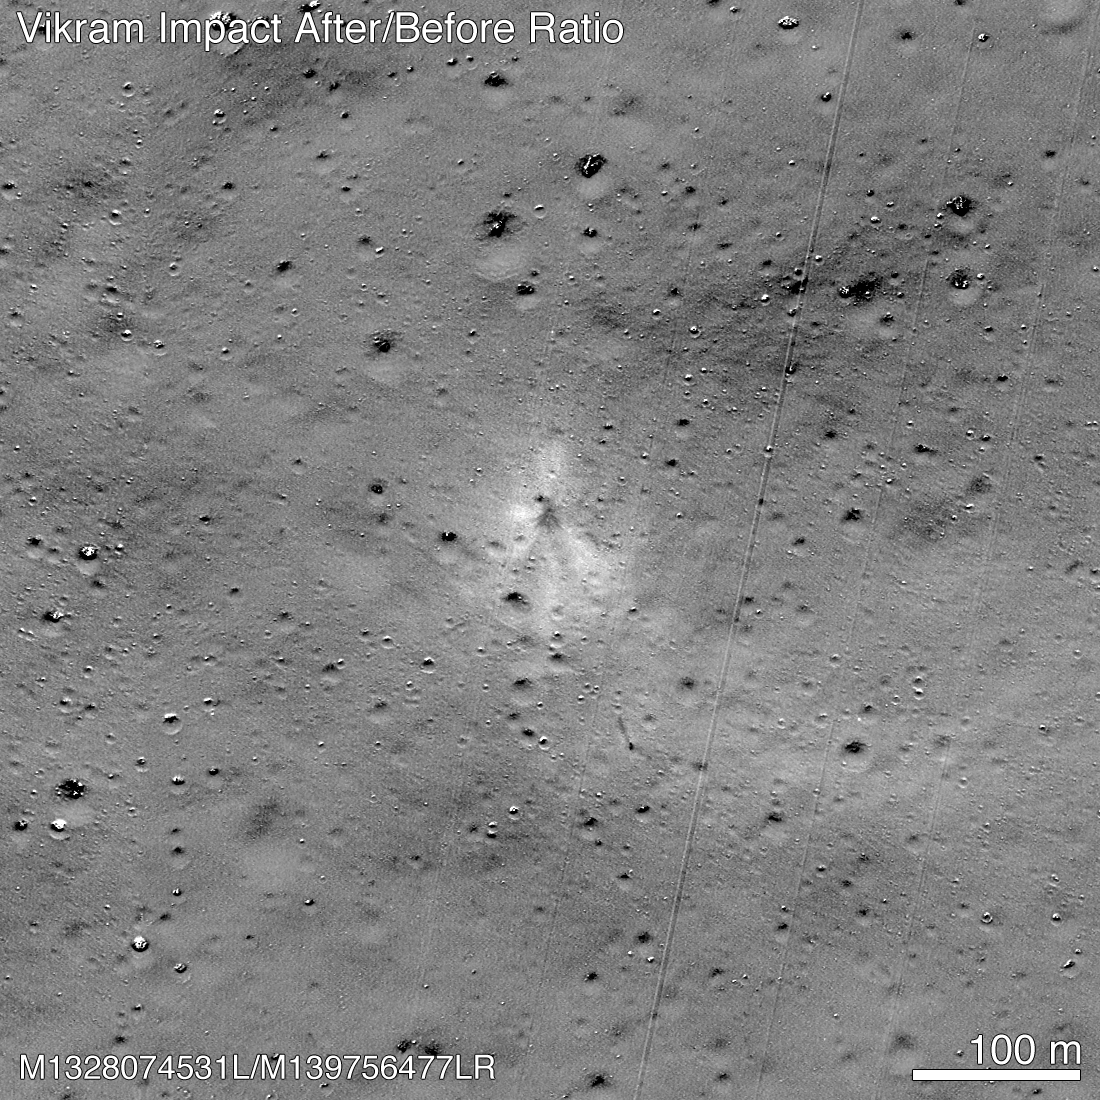 Lune Vikram Chandrayaan